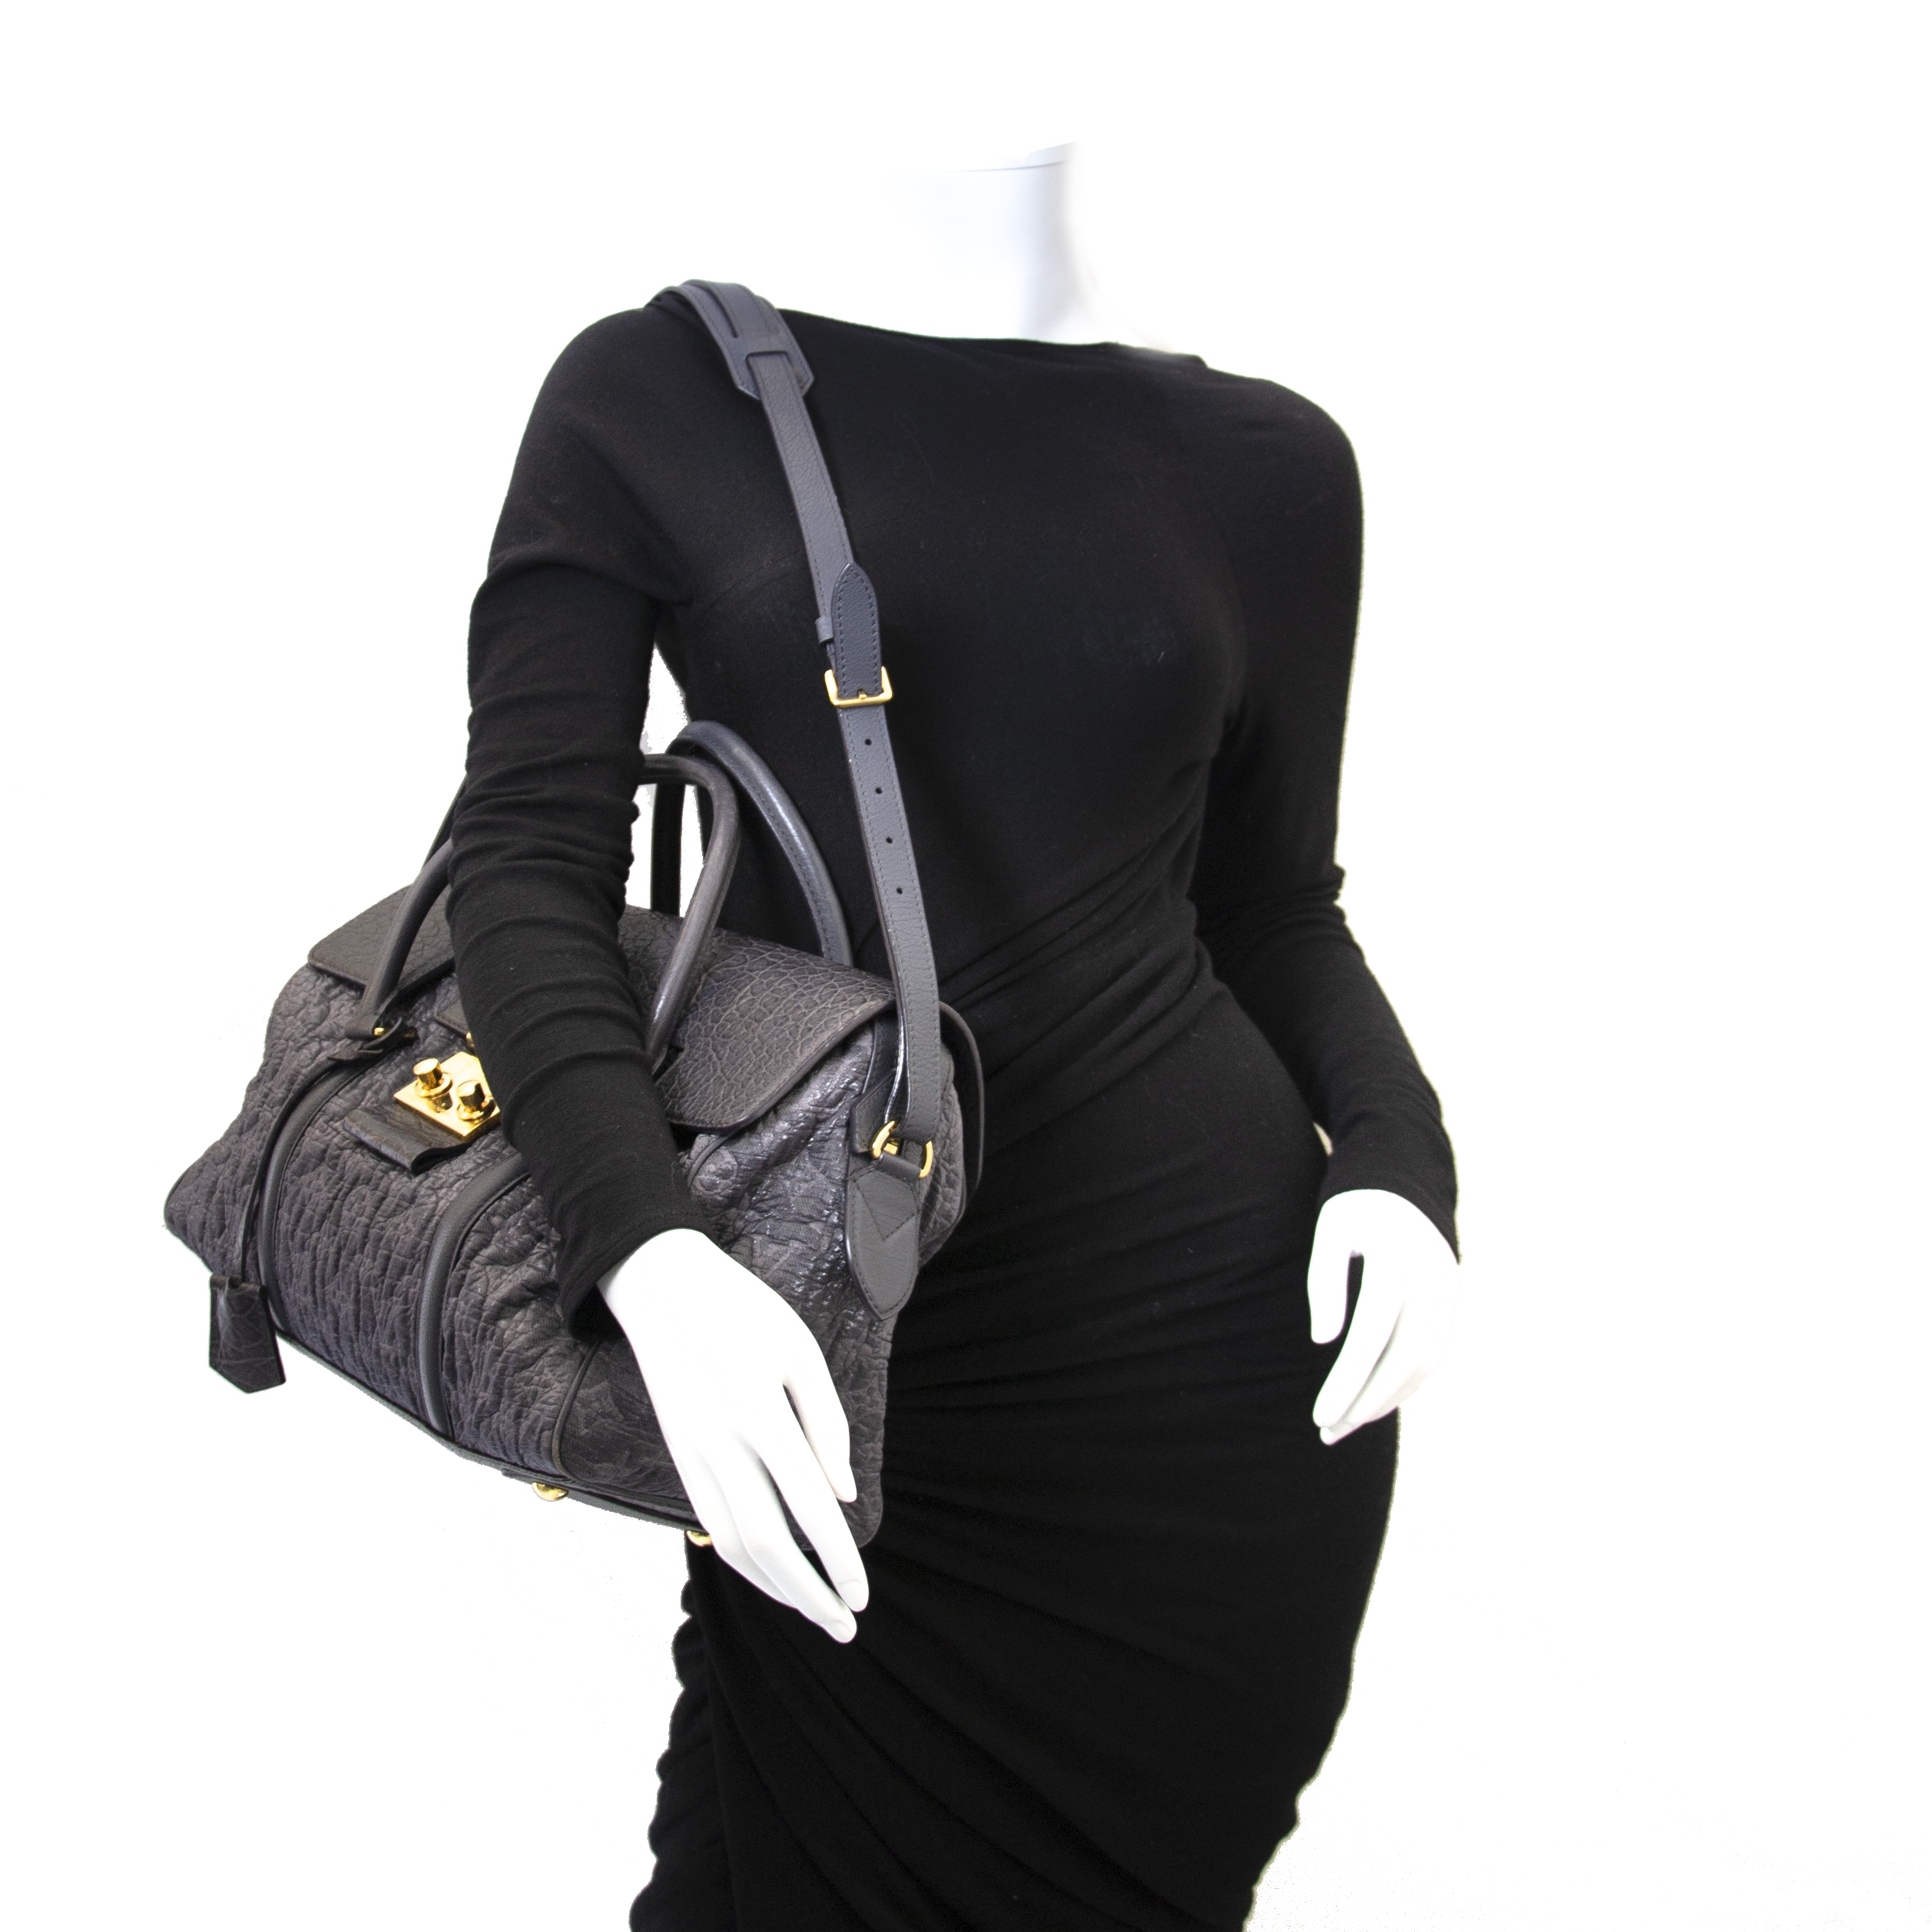 Louis Vuitton Limited Edition Monogram Volupte Psyche Bag